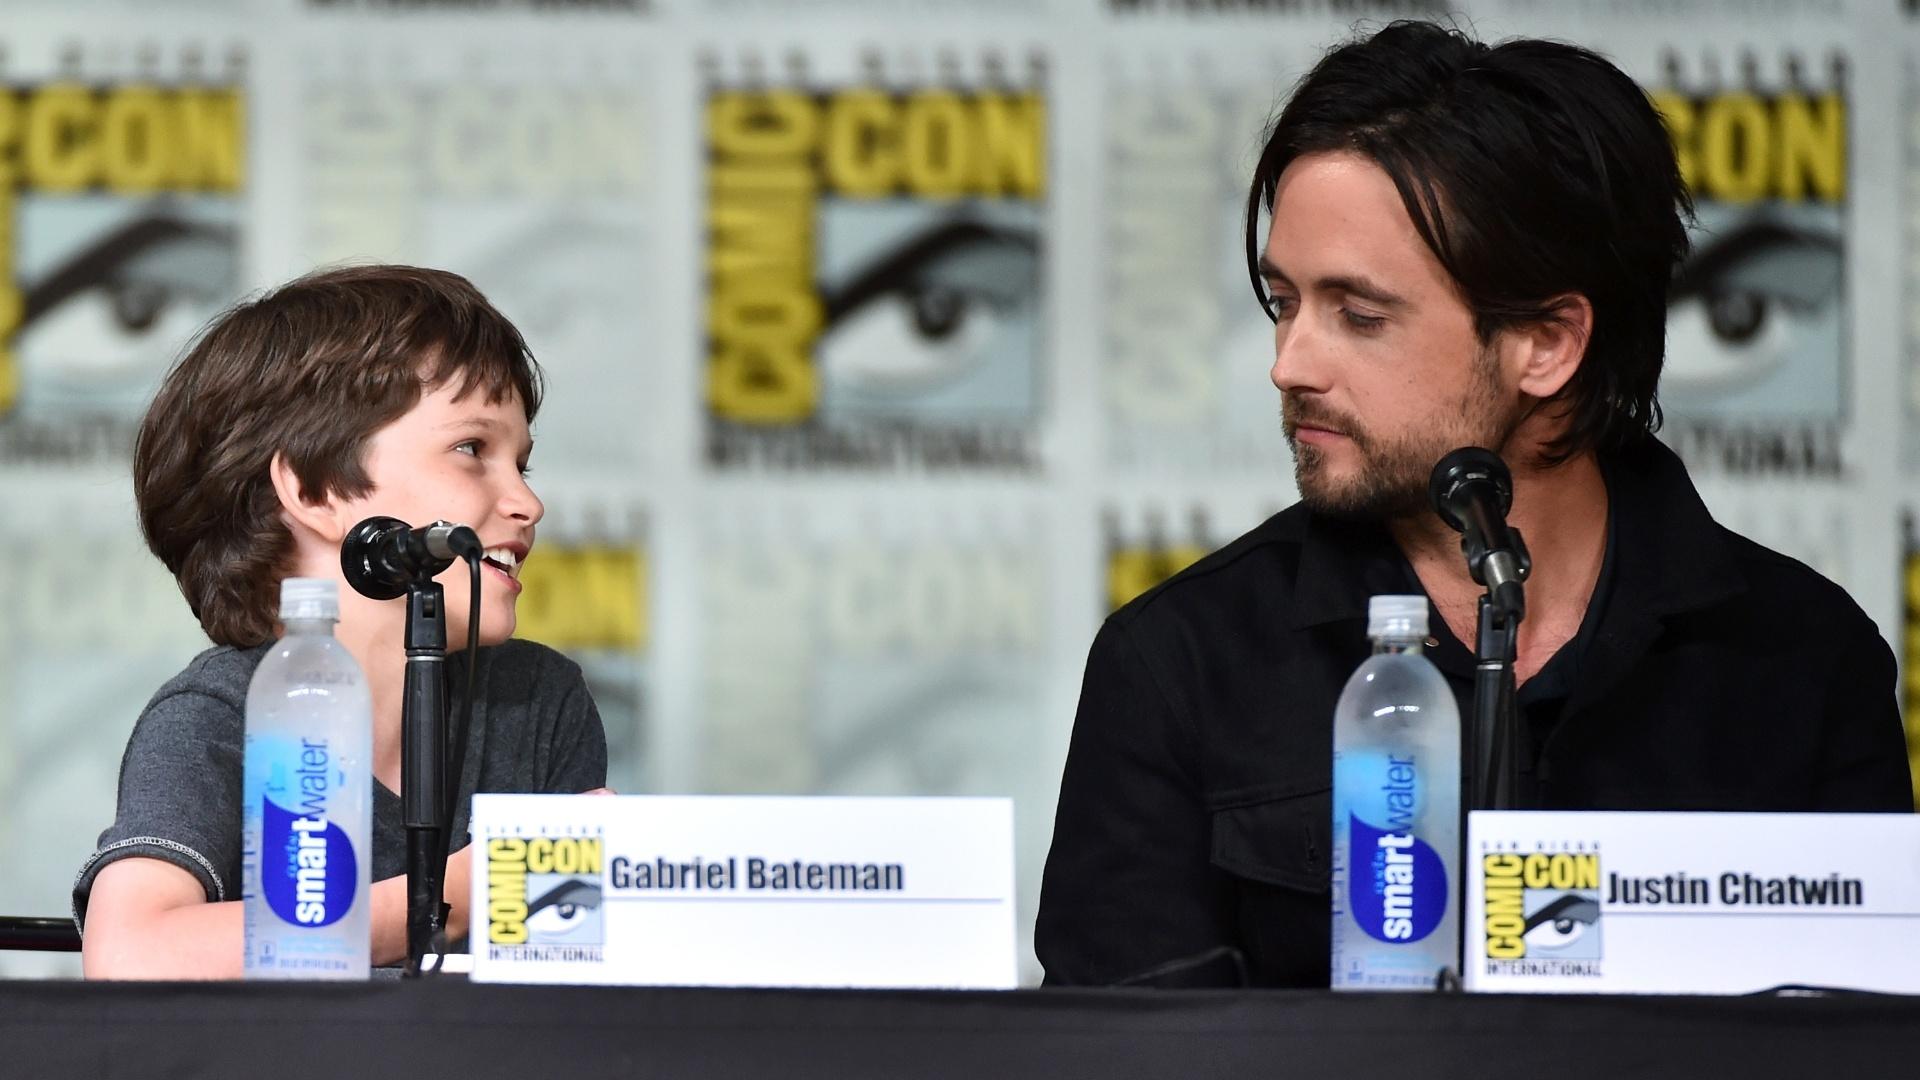 21.jul.2016 - Os atores Gabriel Bateman (esquerda) e Justin Chatwin durante painel das séries